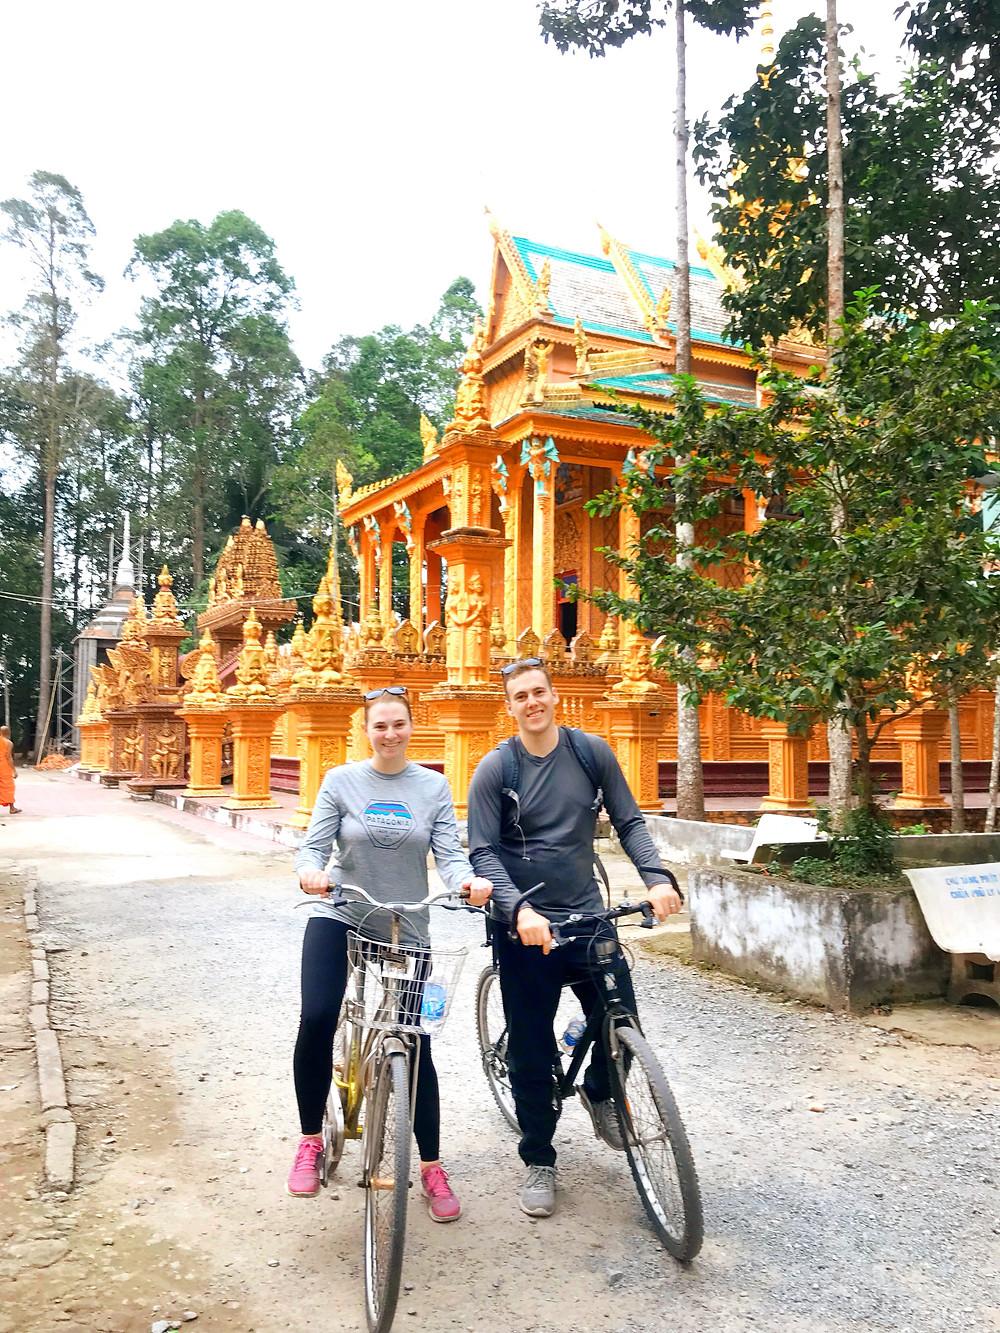 Biking through neighborhoods in the Mekong Delta